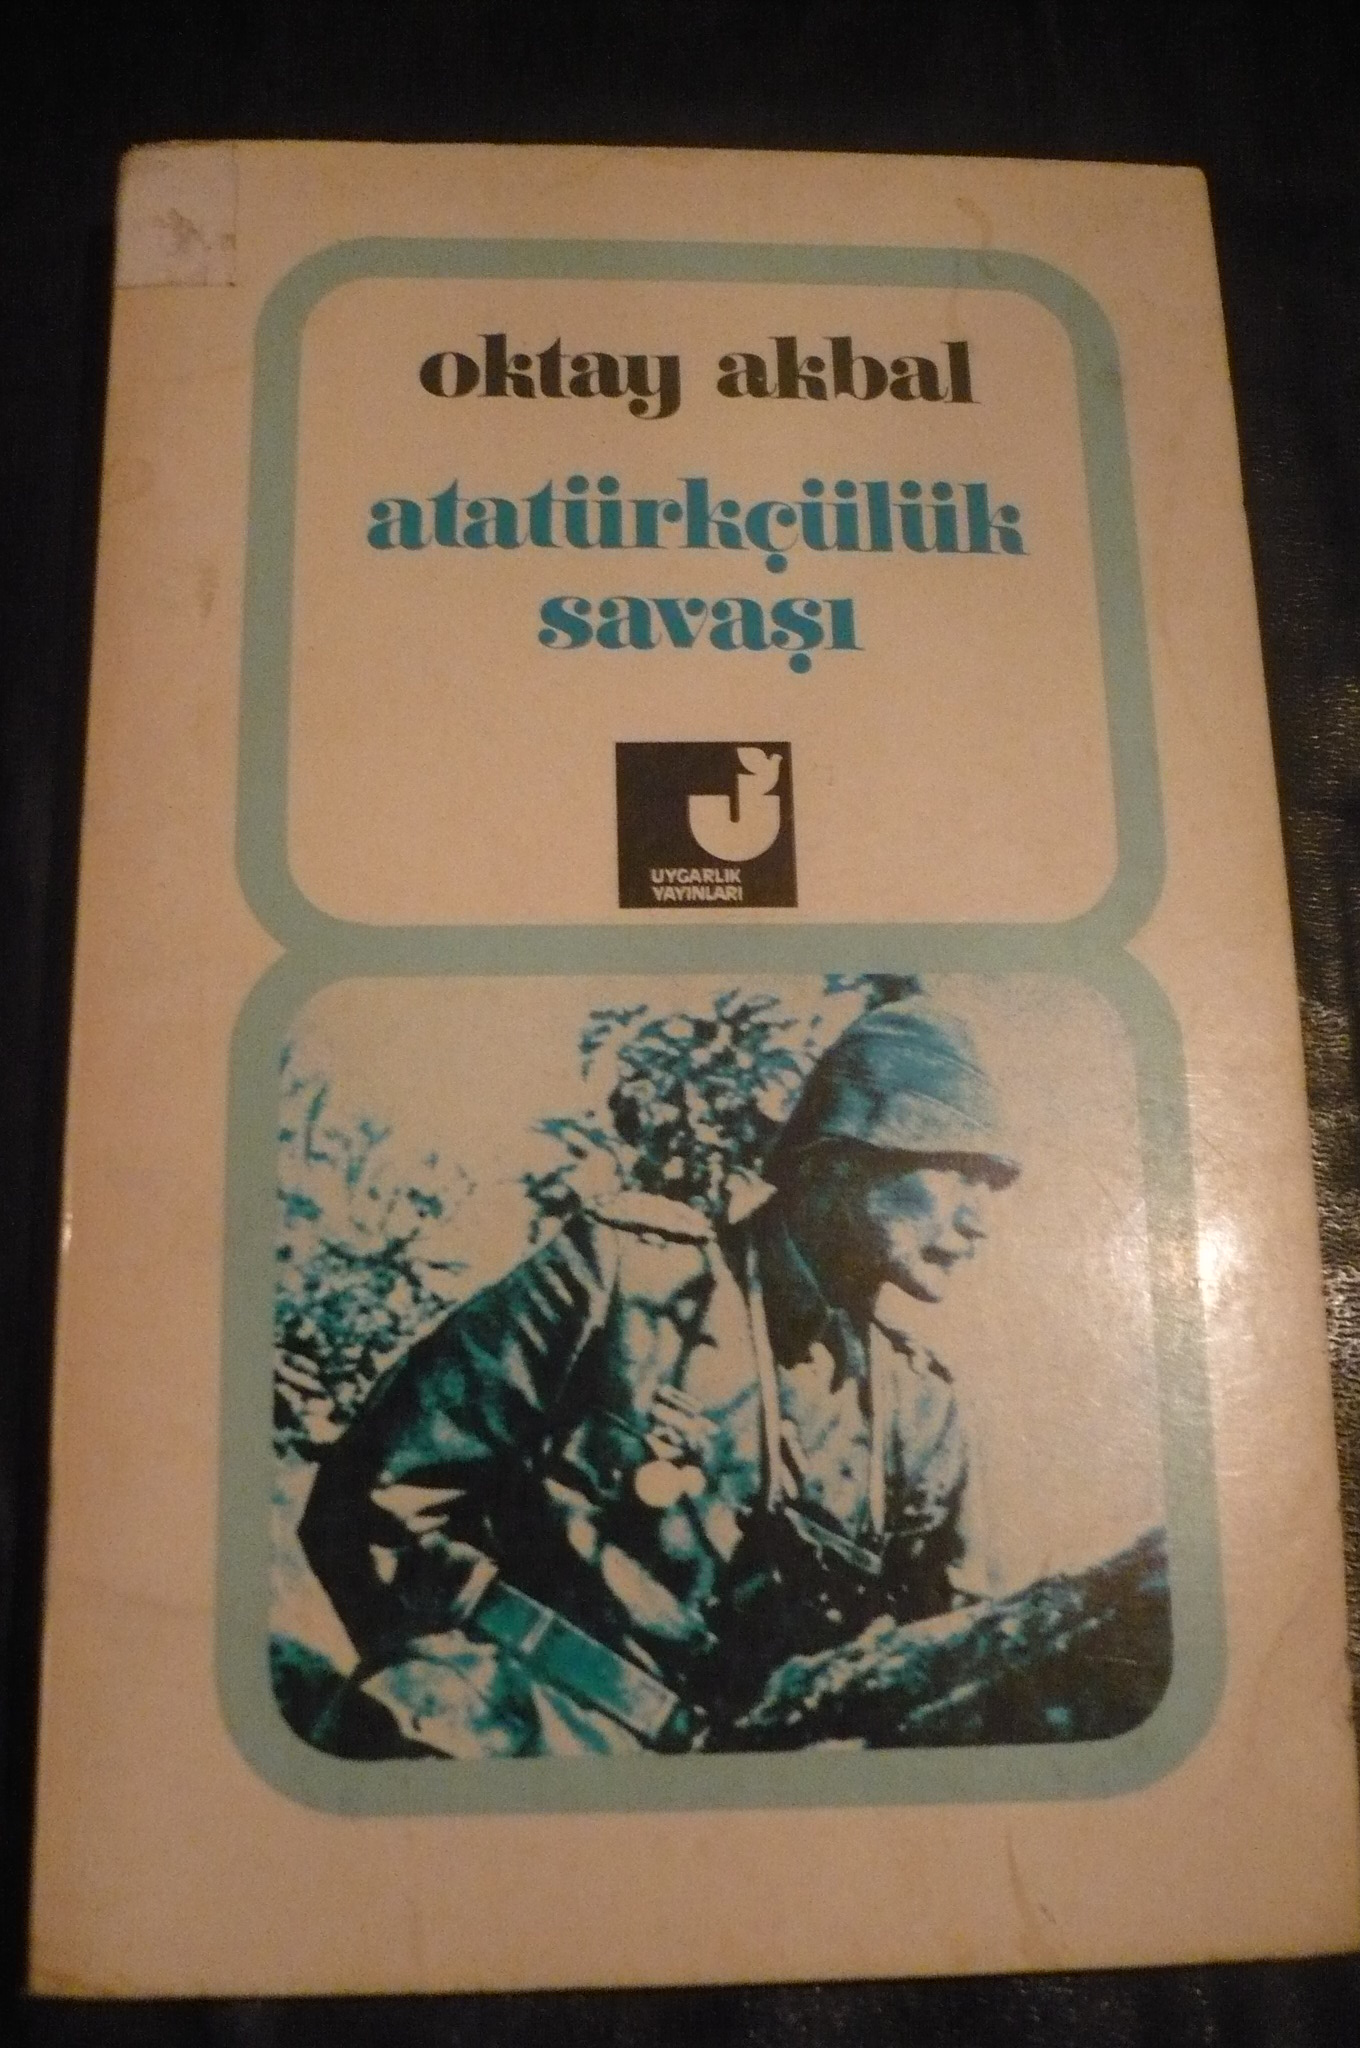 ATATÜRKÇÜLÜK SAVAŞI/Oktay AKBAL/ 10 TL